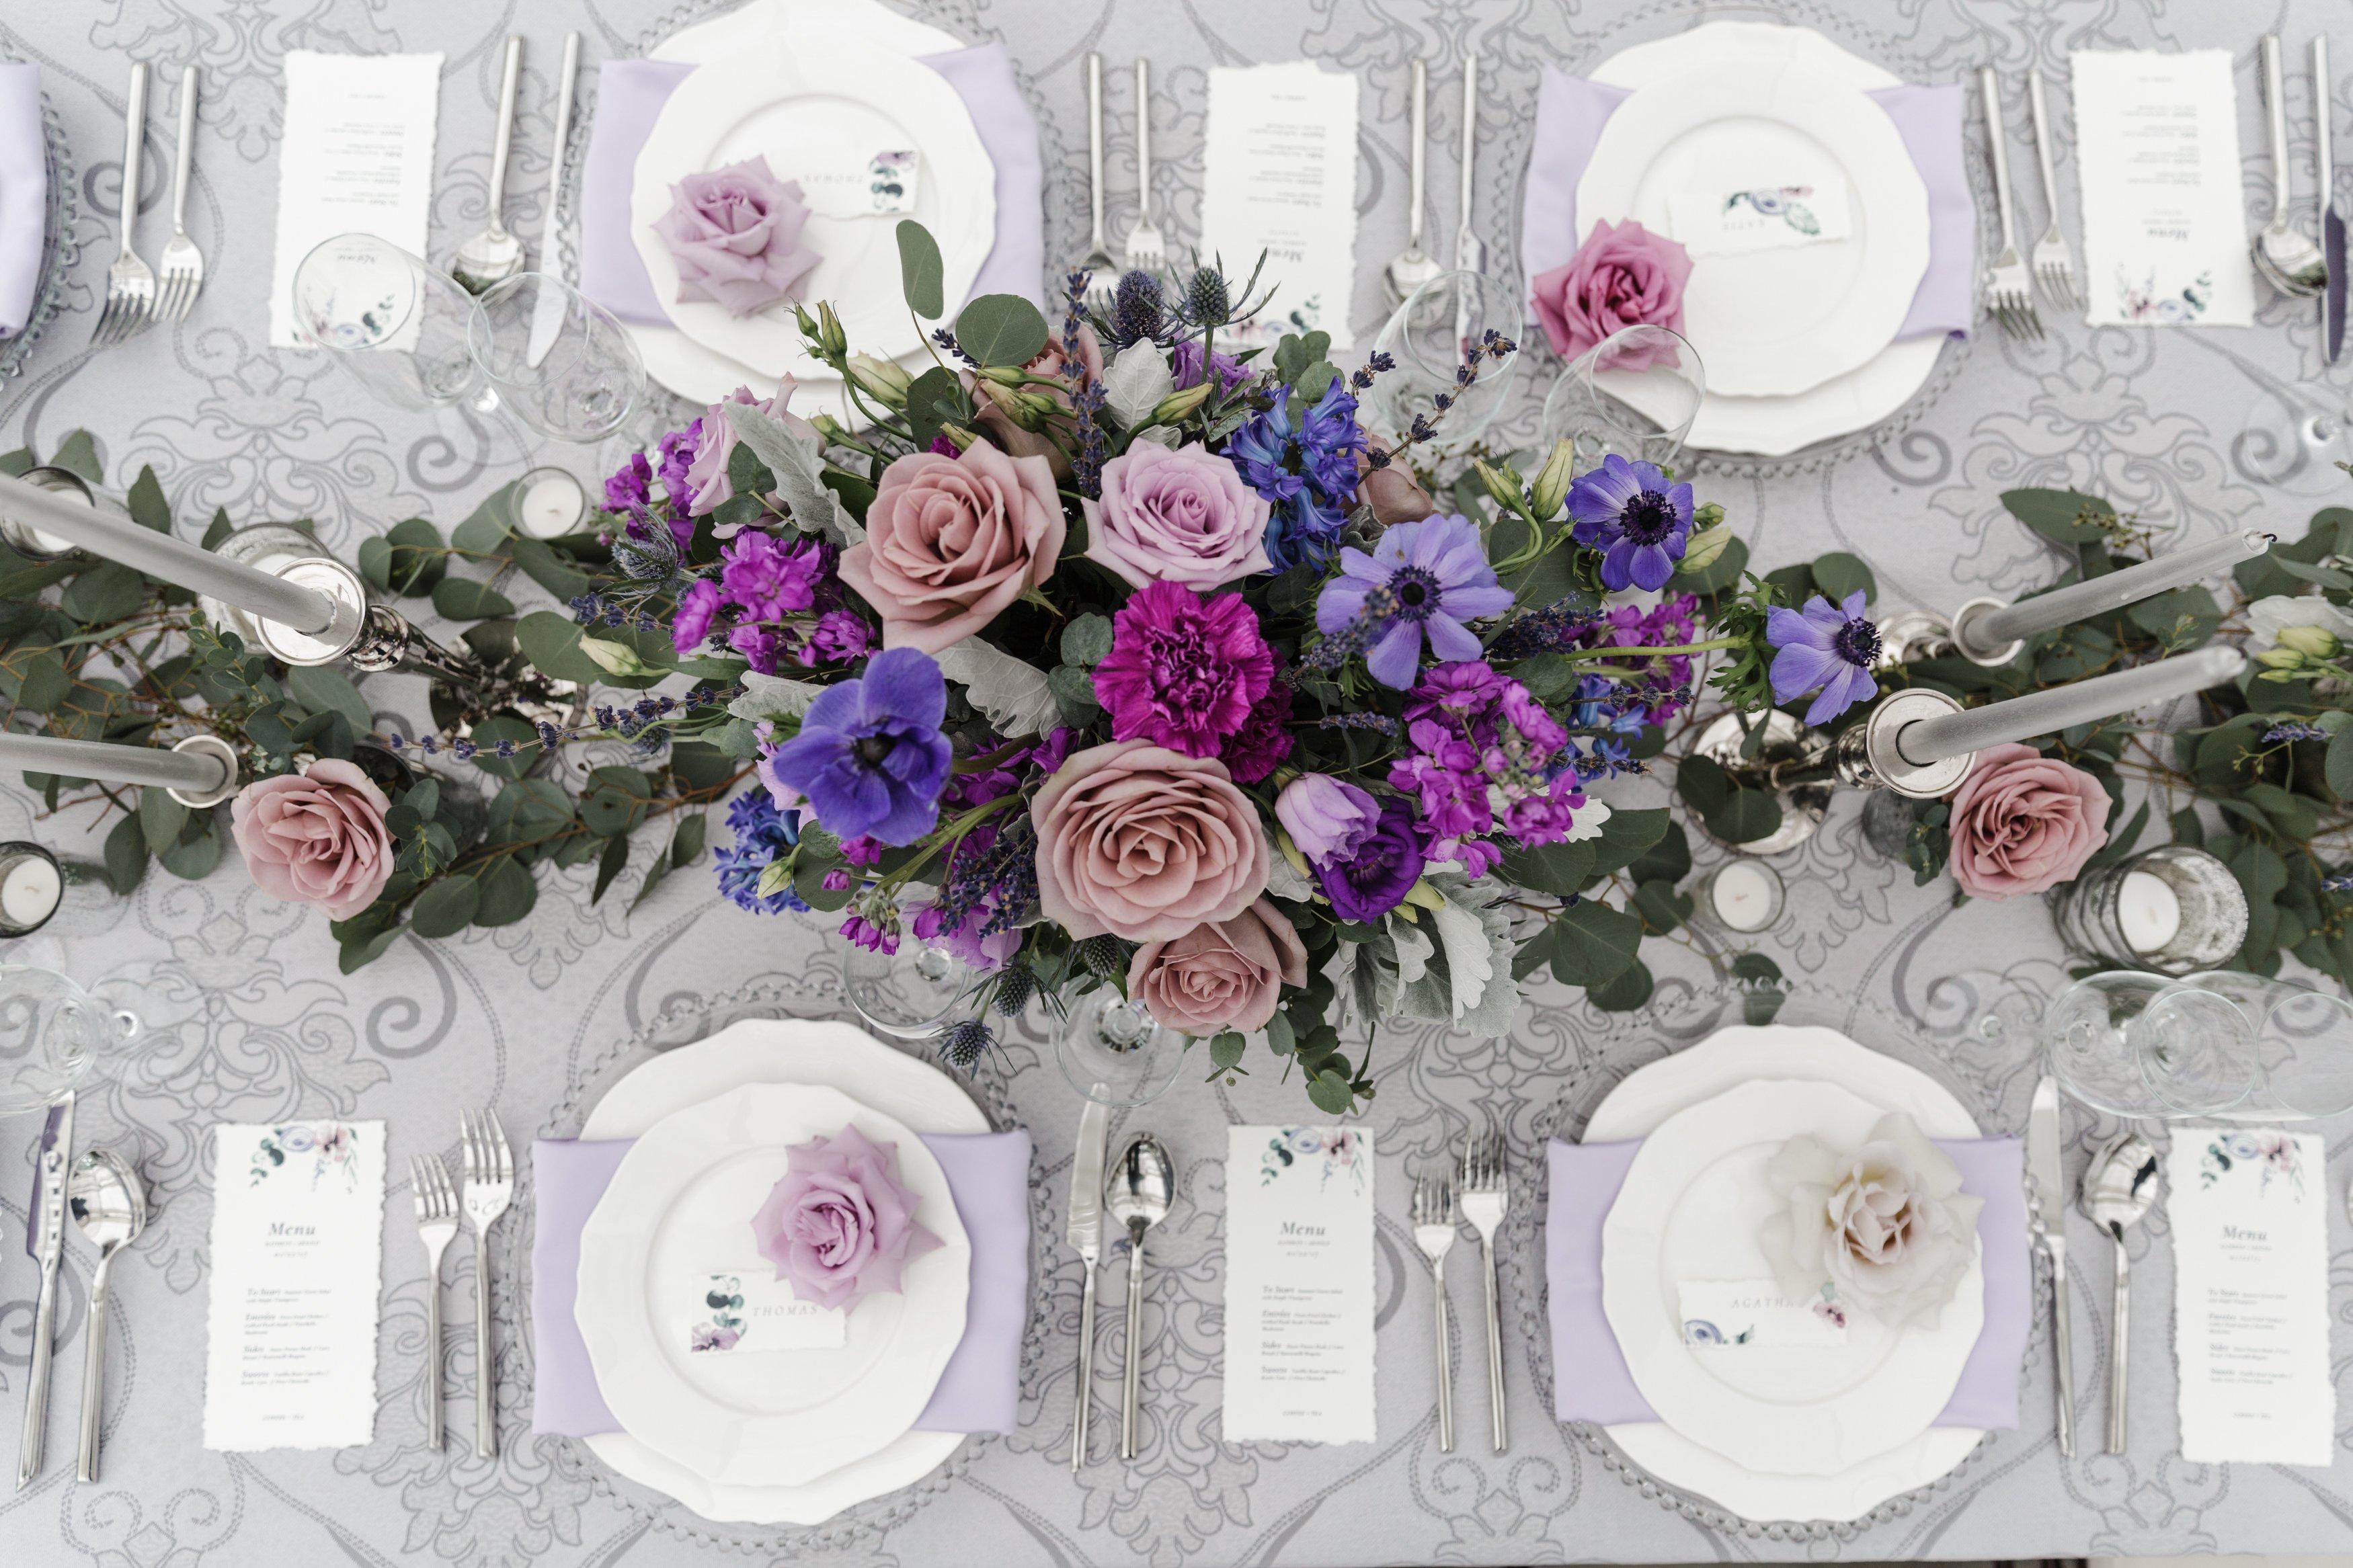 floral-fixx-wedding-arrangement